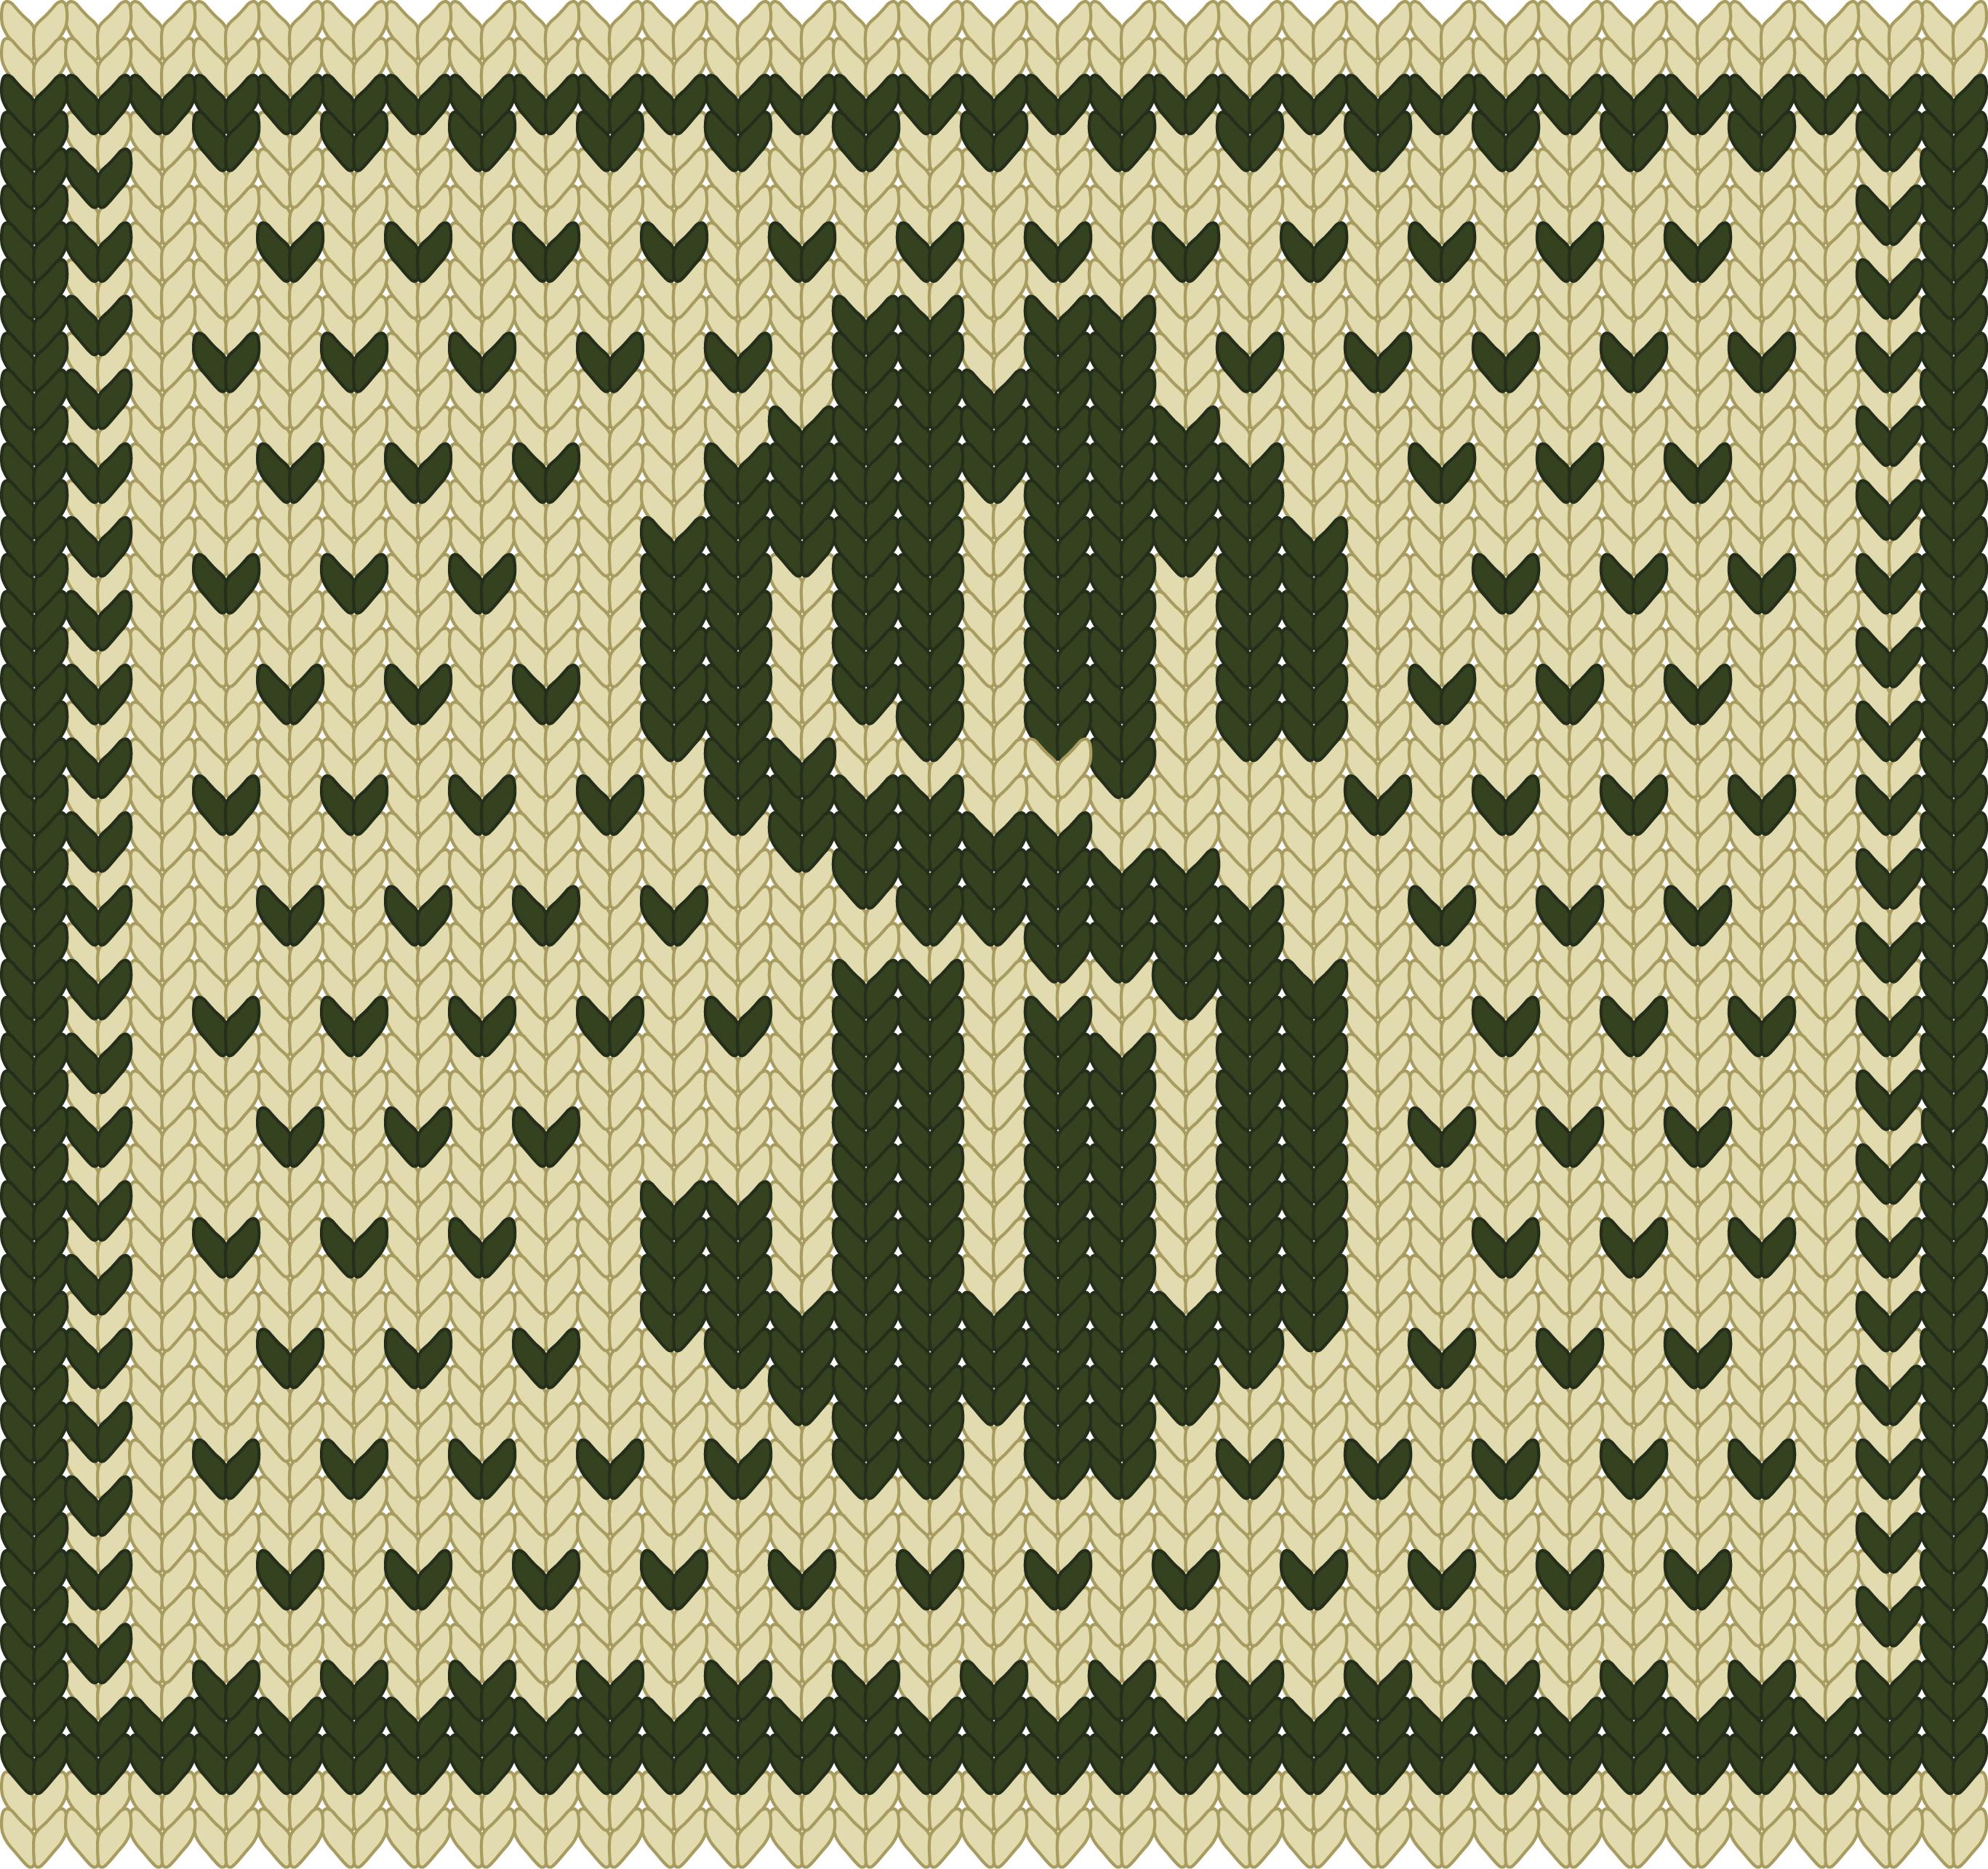 knitmoney